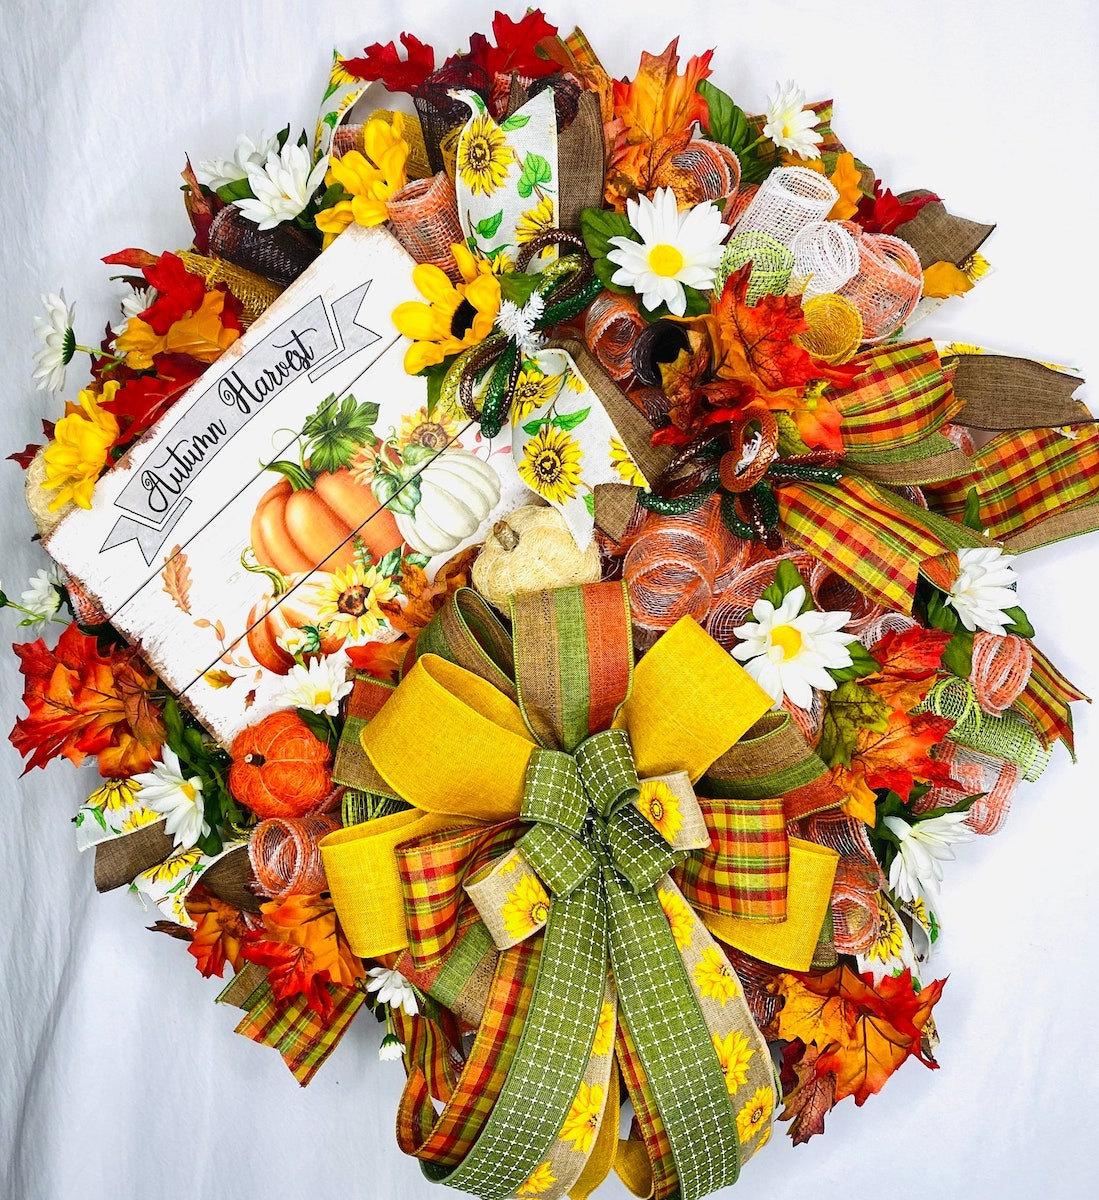 Fall wreath with pumpkin sign